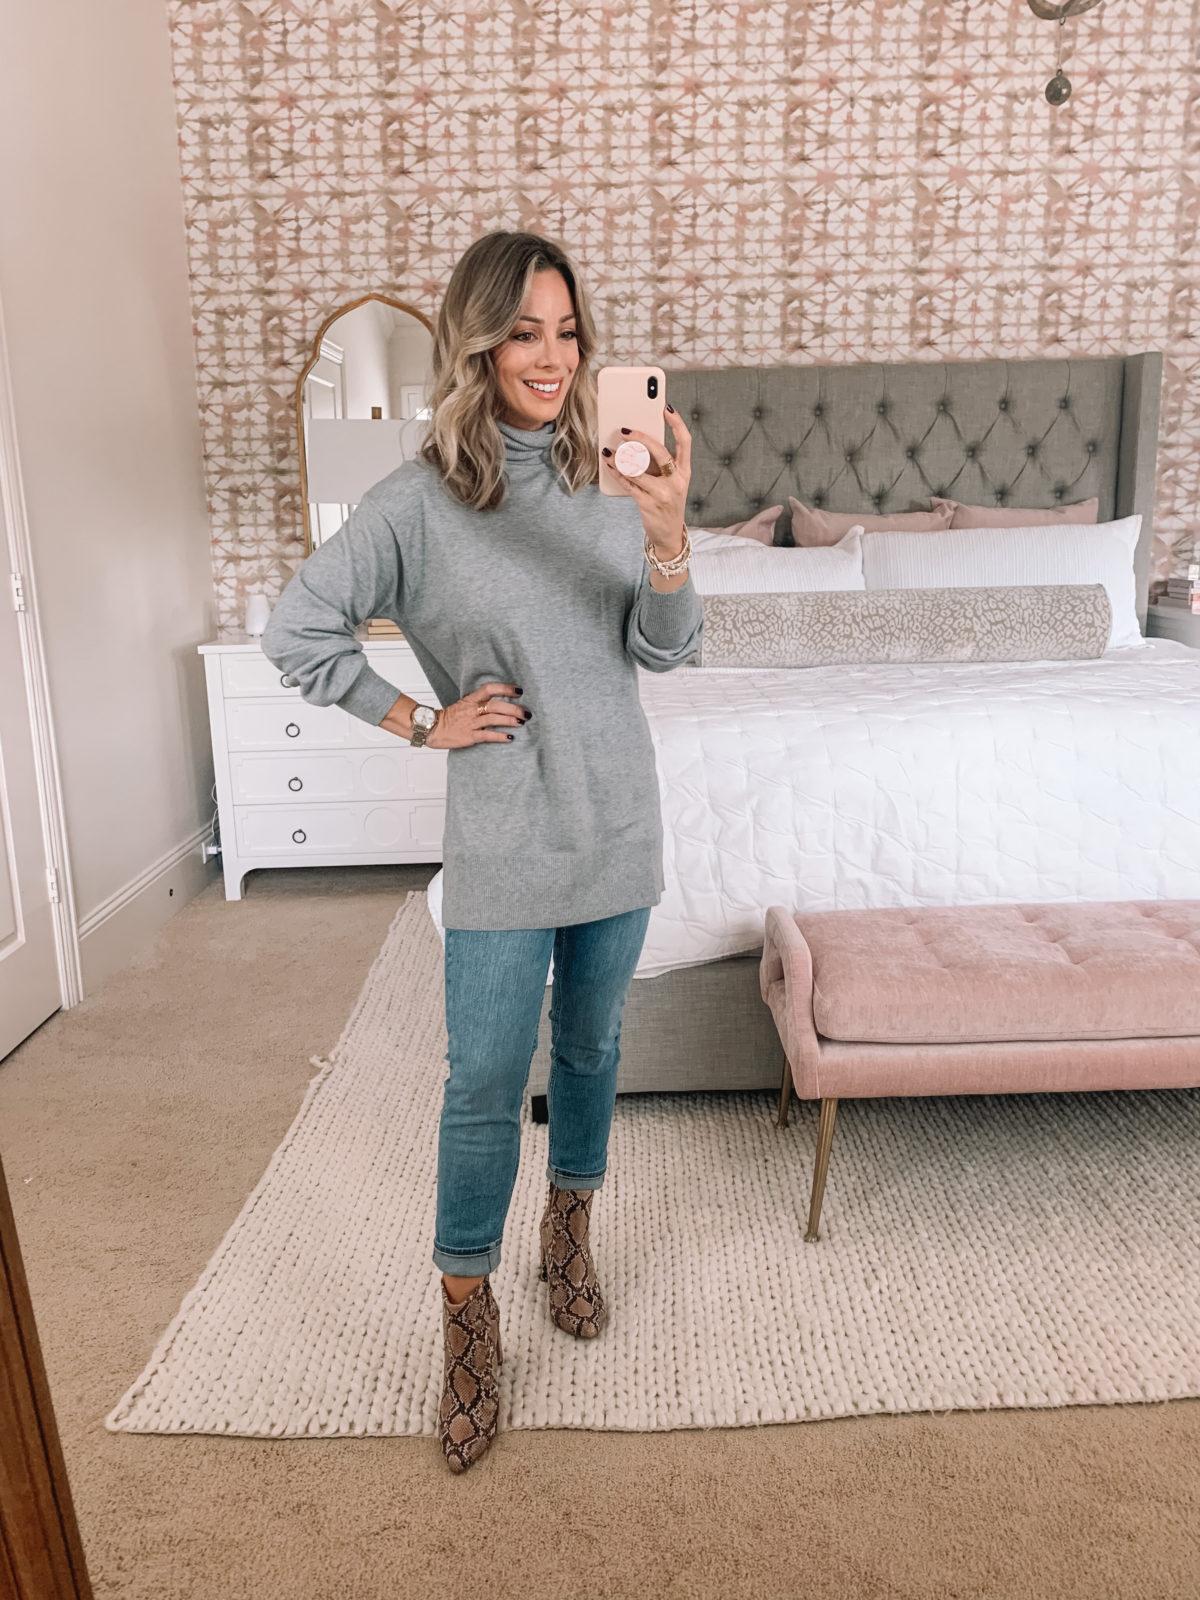 Walmart Fashion, Turtle neck Tunic, Jeans, Snakeskin Booties